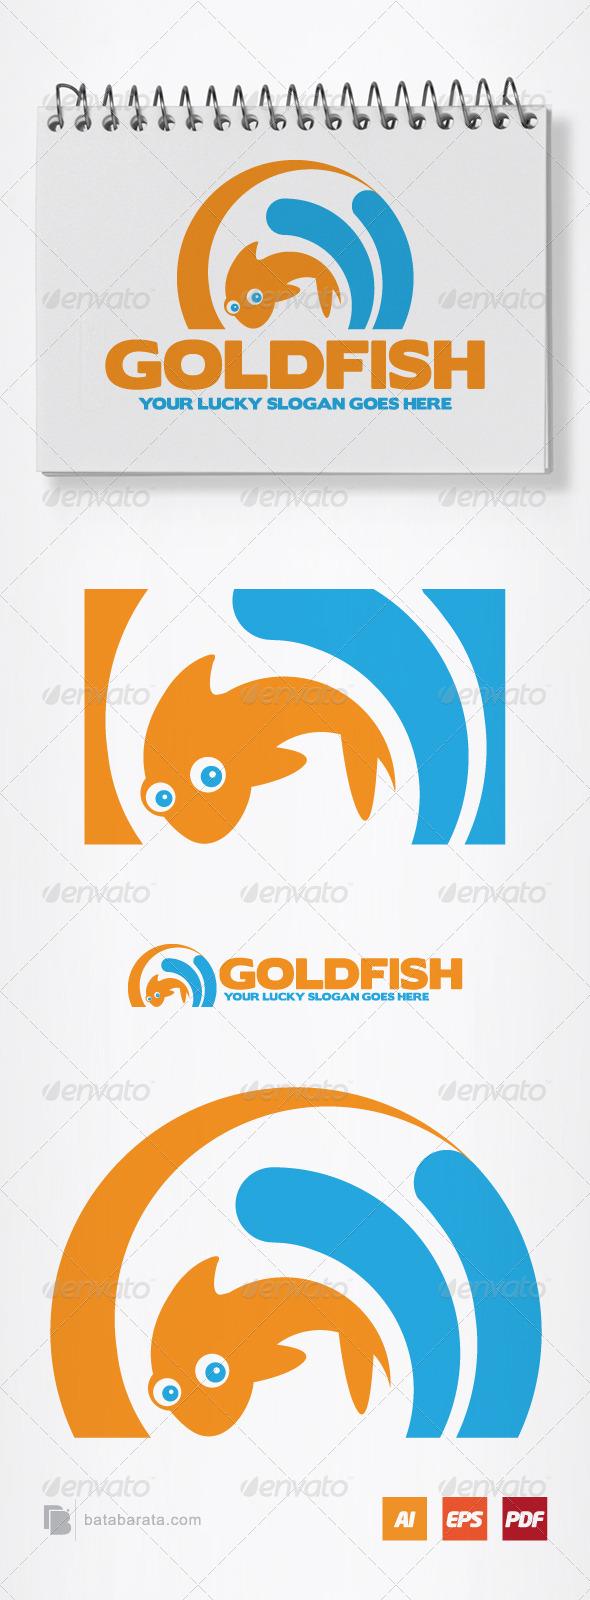 goldfsh